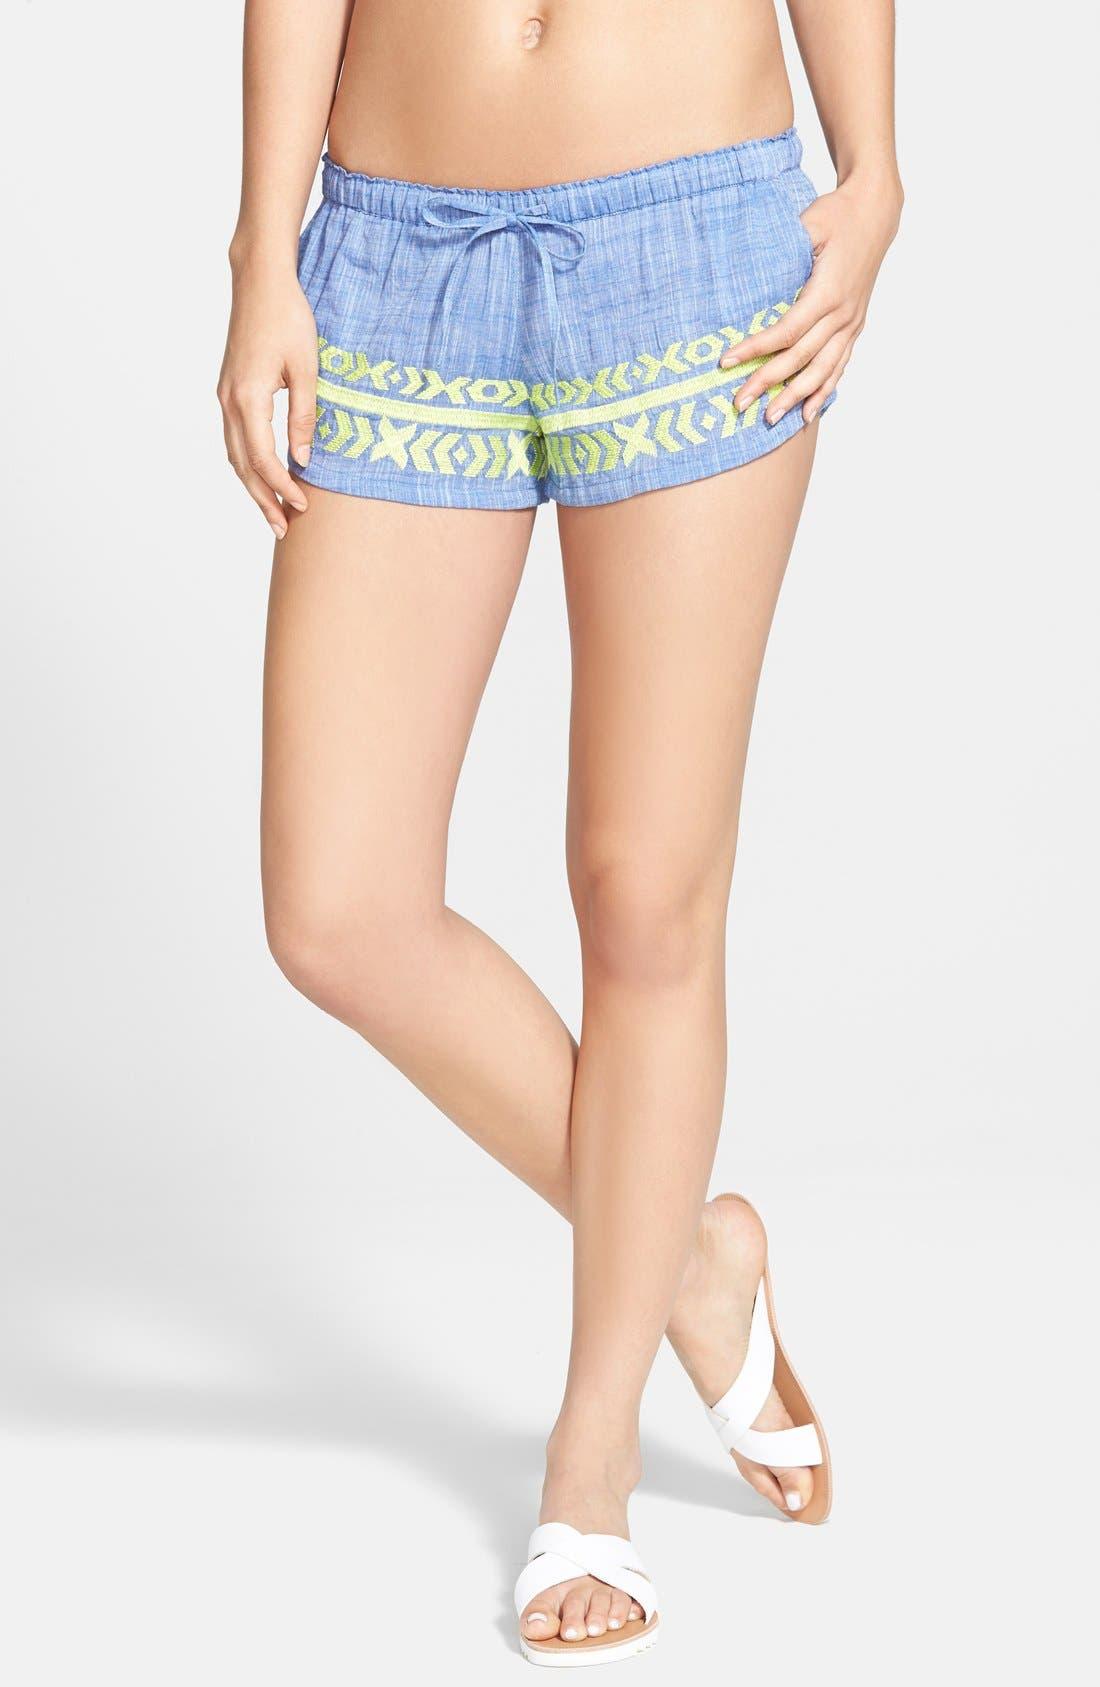 Alternate Image 1 Selected - Rip Curl 'Marisol' Chambray Shorts (Juniors)